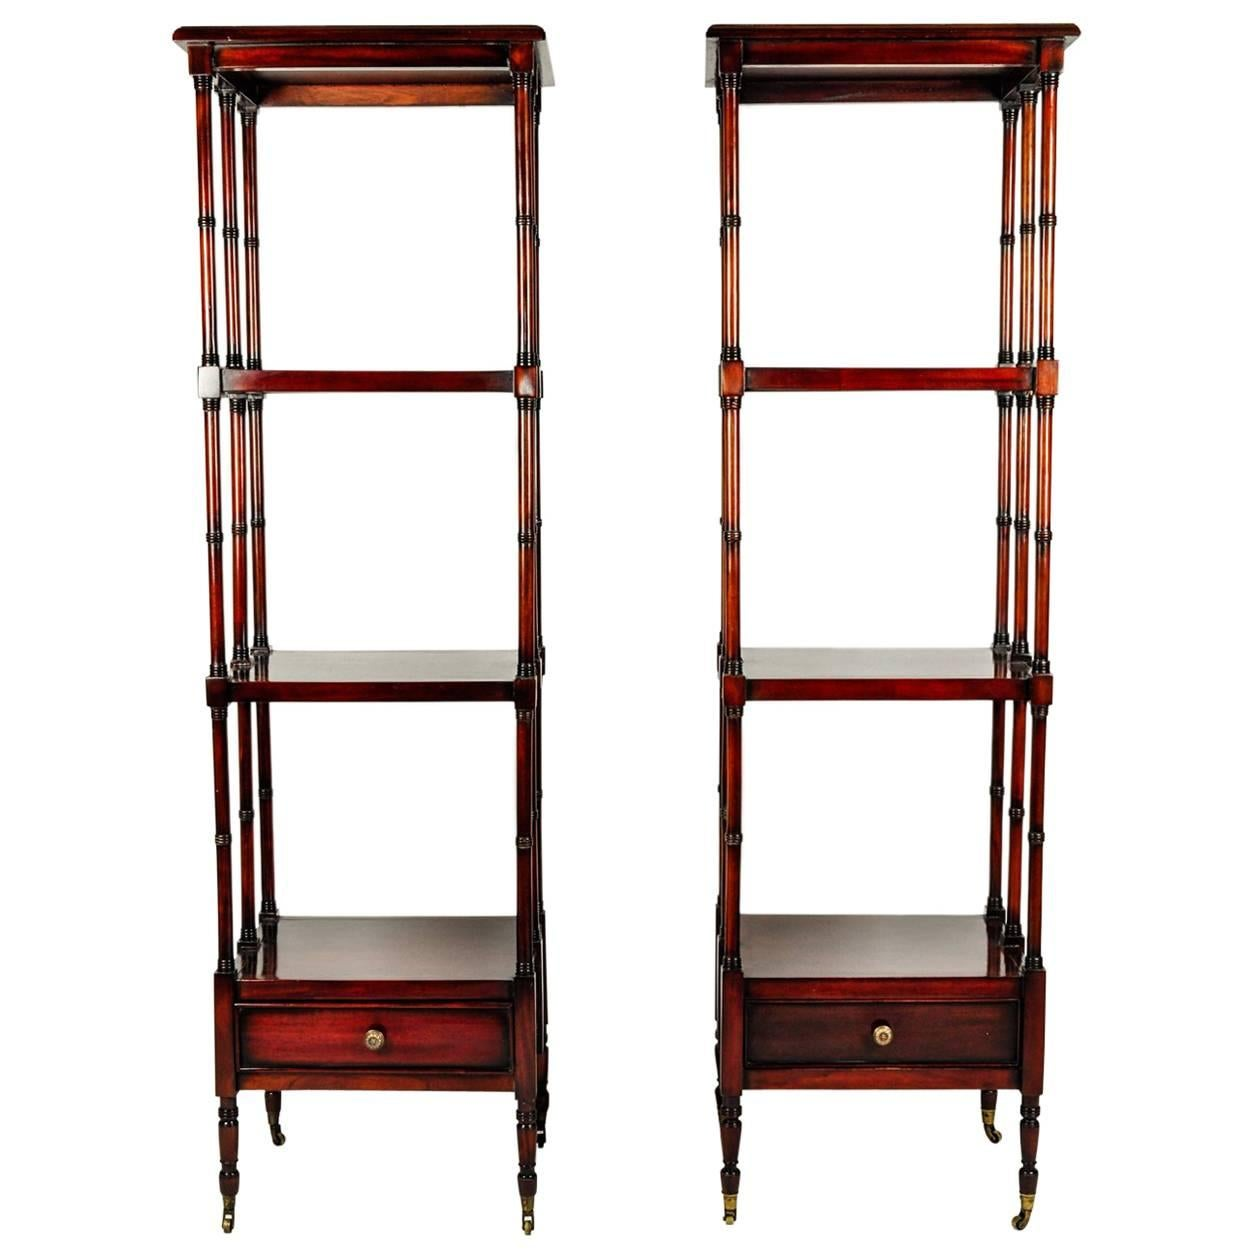 Vintage Pair Of Solid Mahogany Wood Display Etageres / Shelves